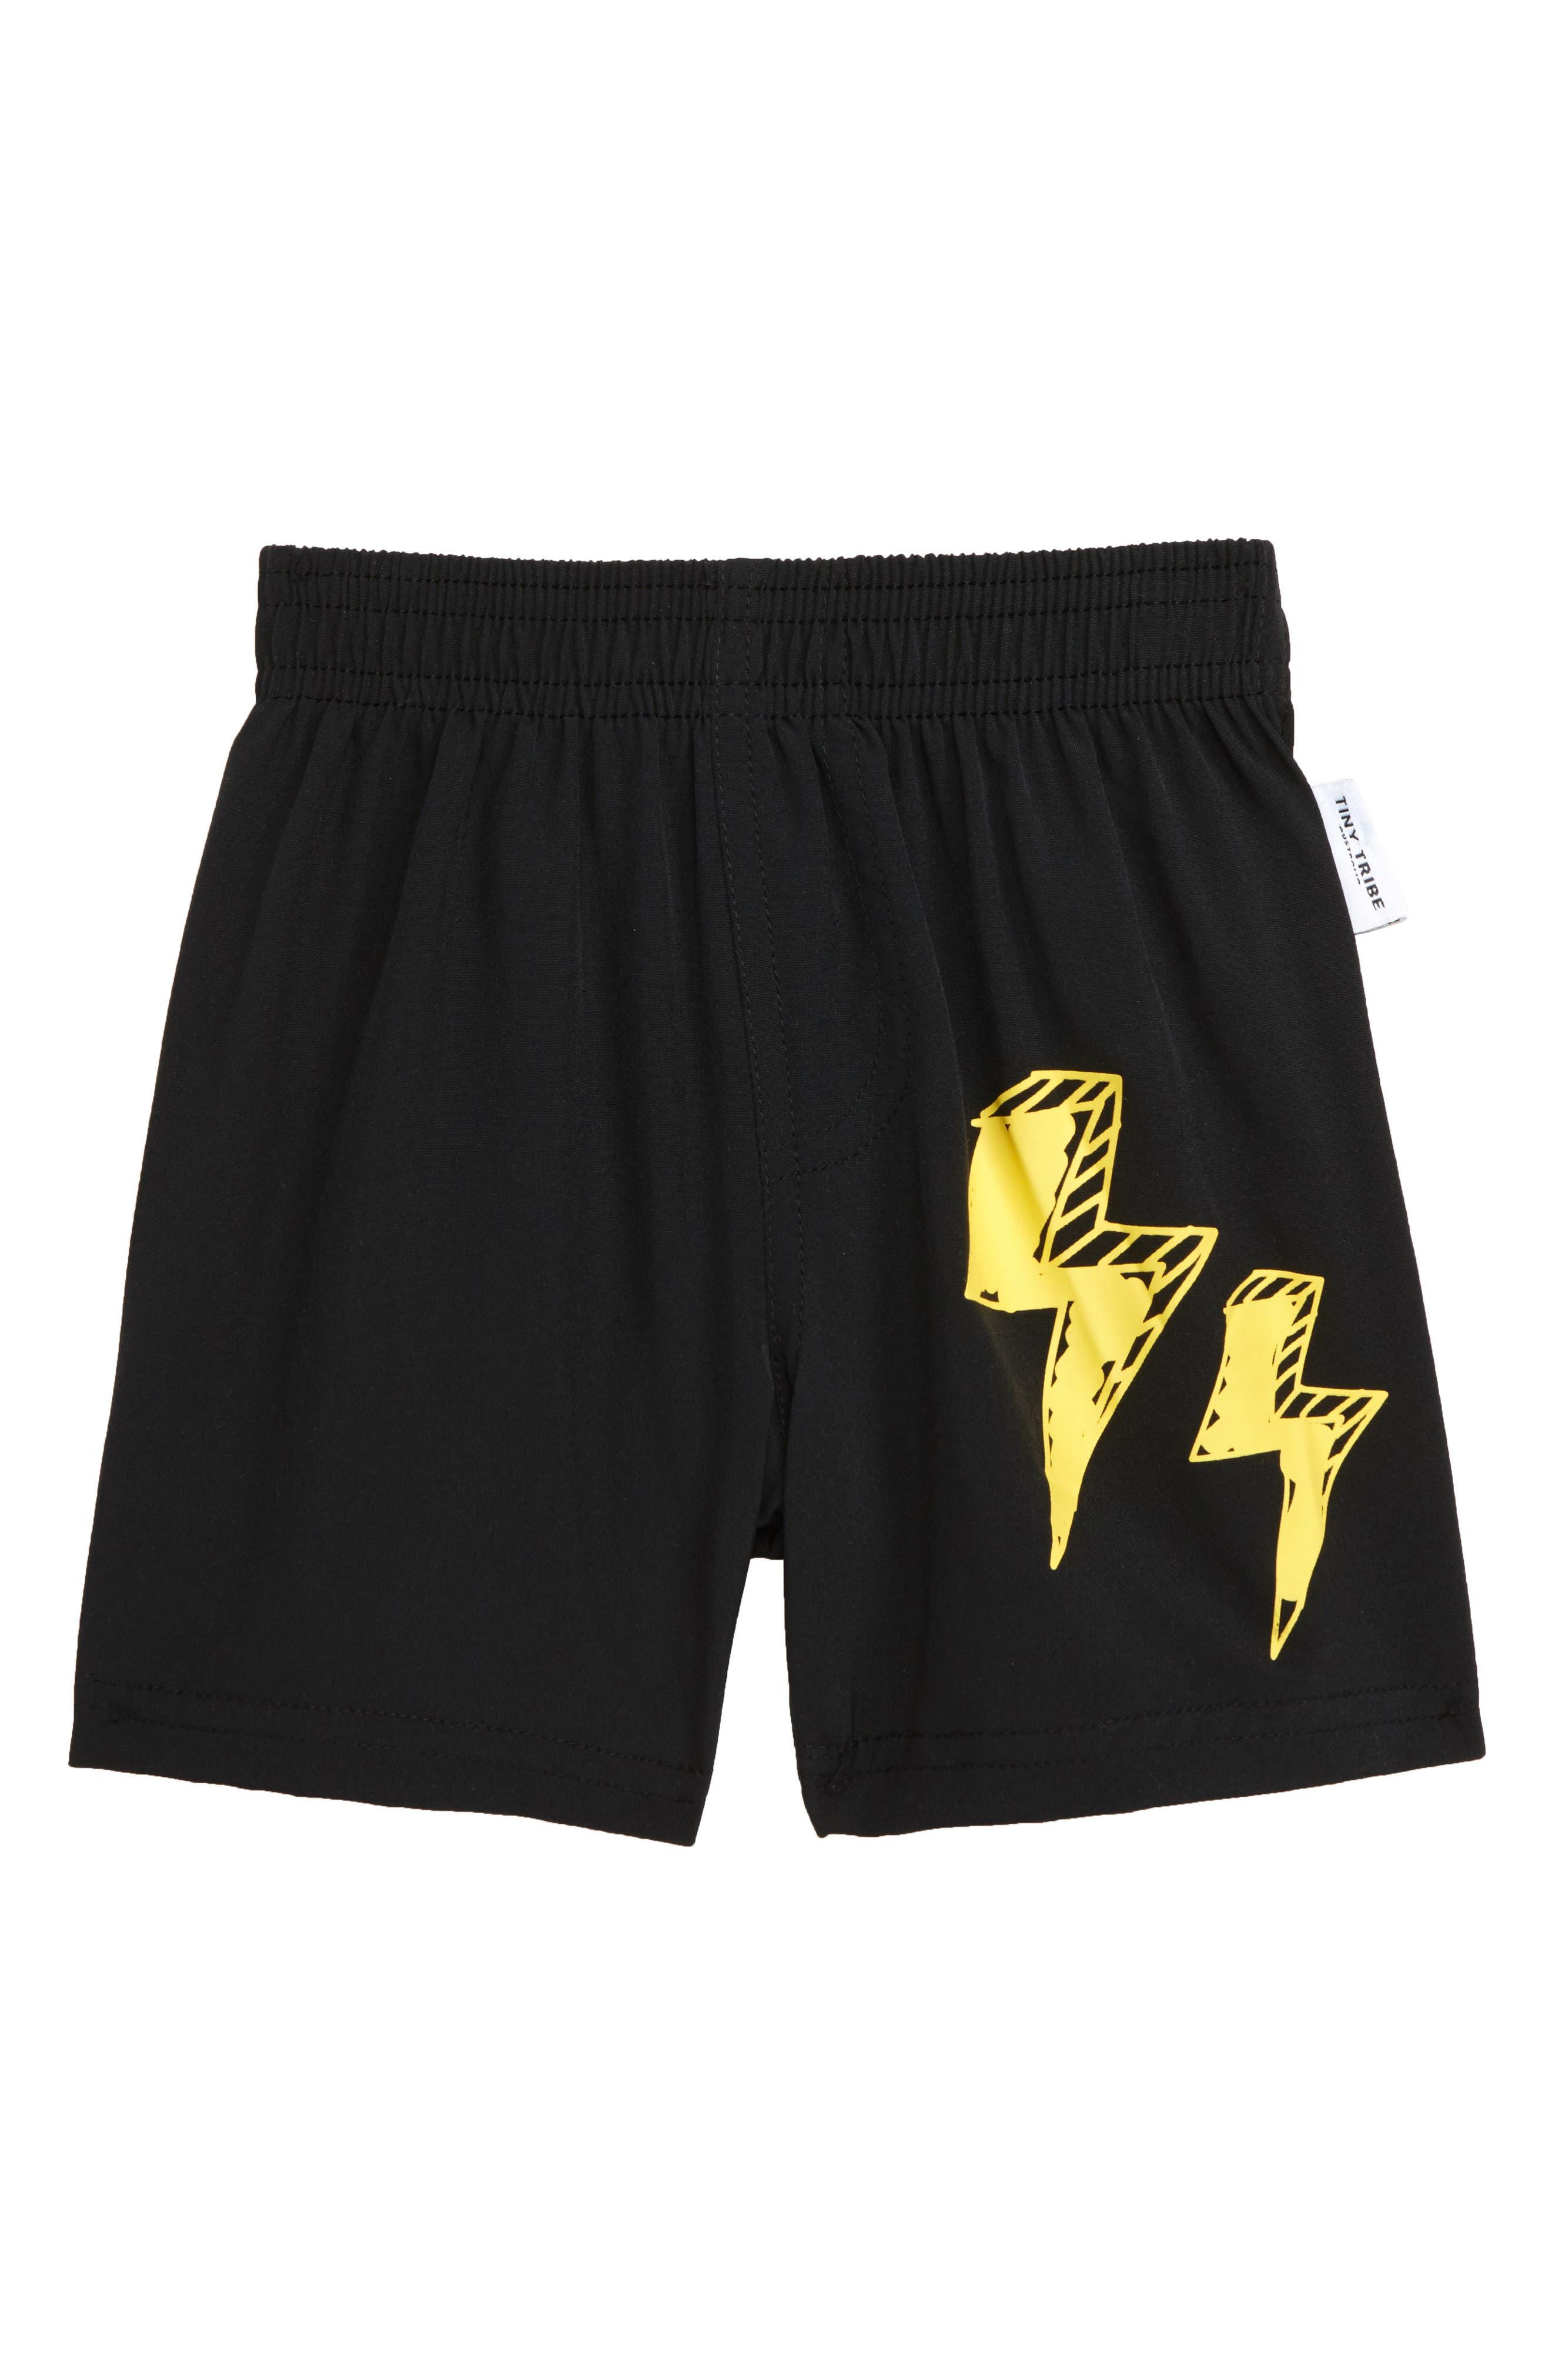 Lightning Board Shorts,                             Main thumbnail 1, color,                             BLACK